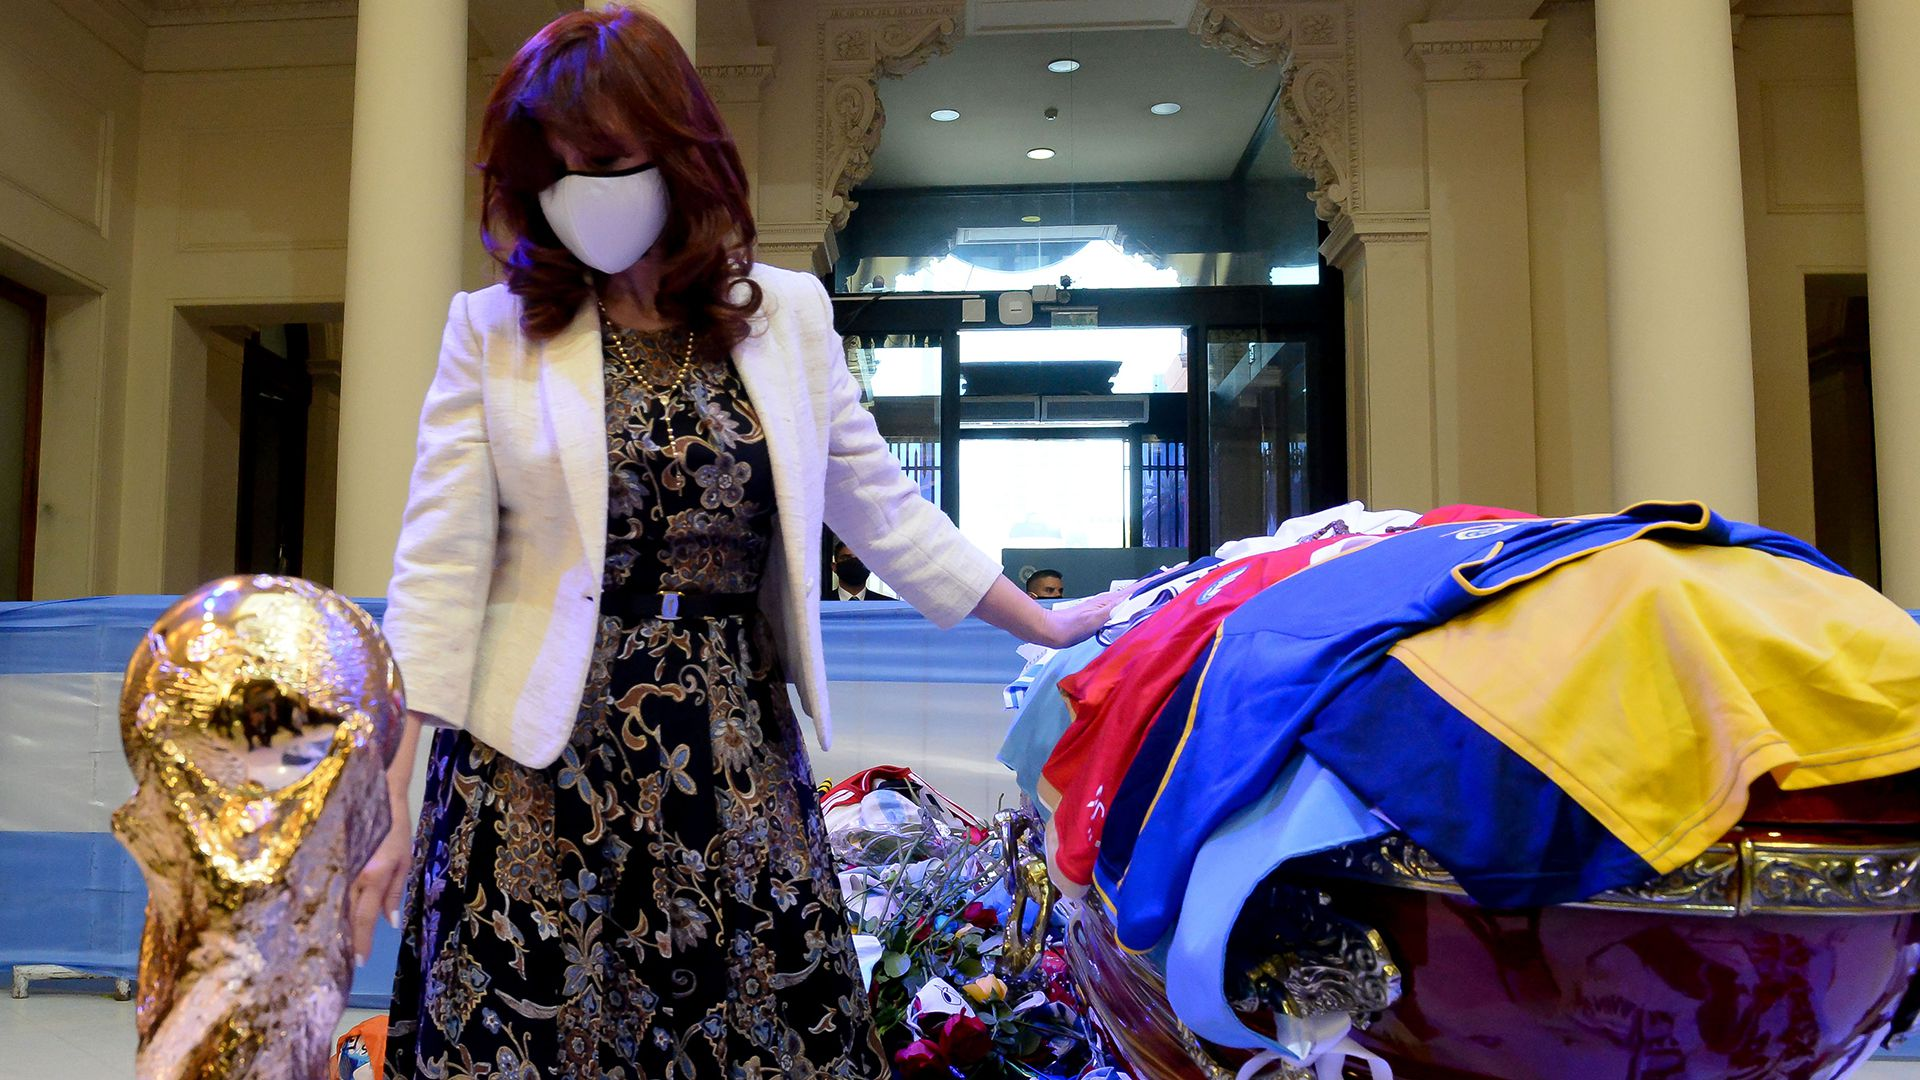 Cristina Fernández de Kirchner - Velatorio Diego Armando Maradona en Casa Rosada